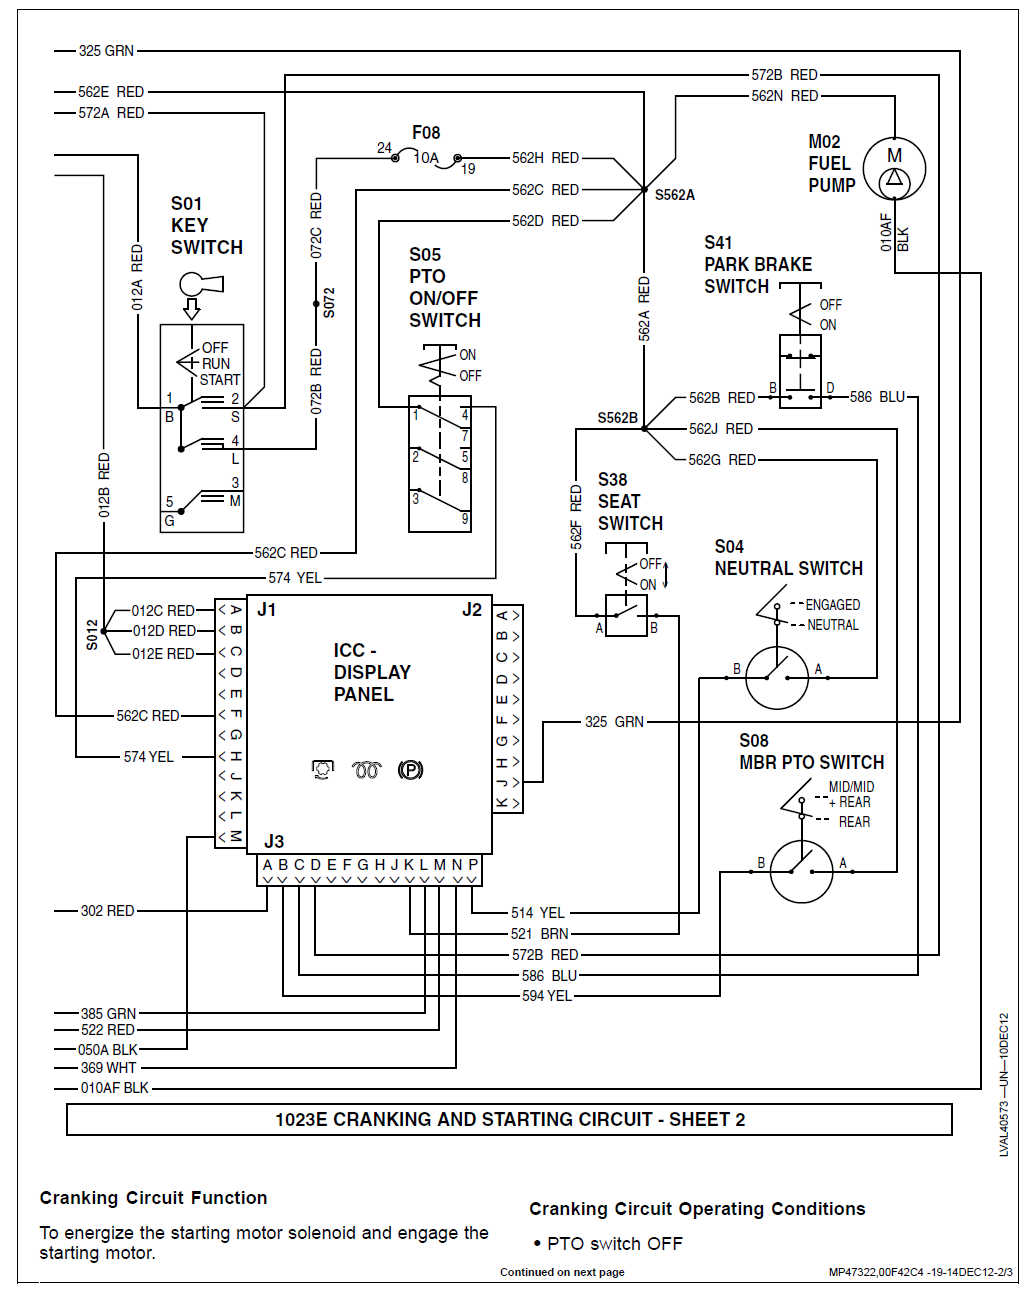 diagnose fuel solenoid 1023 Page 2 – John Deere 1023e Wiring Diagram